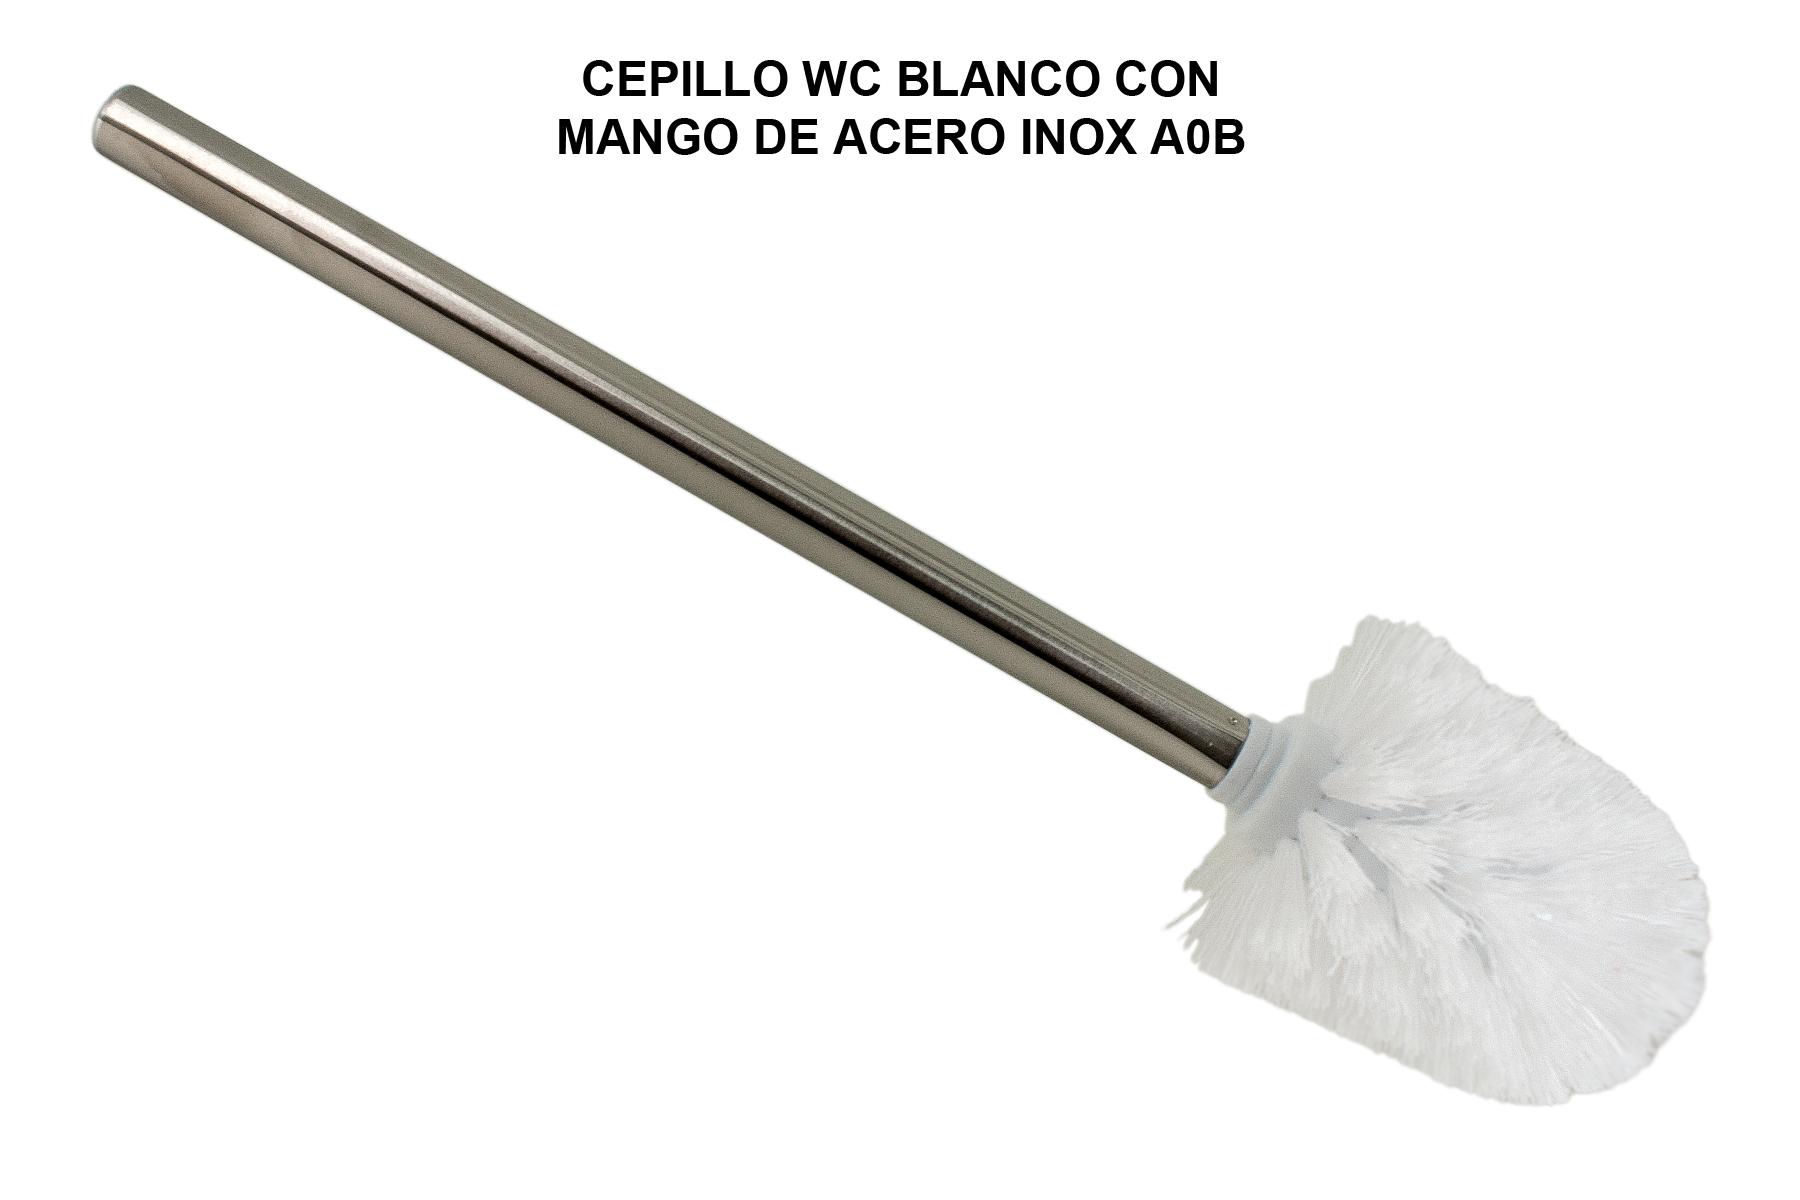 CEPILLO WC BLANCO CON MANGO DE ACERO INOX A0B